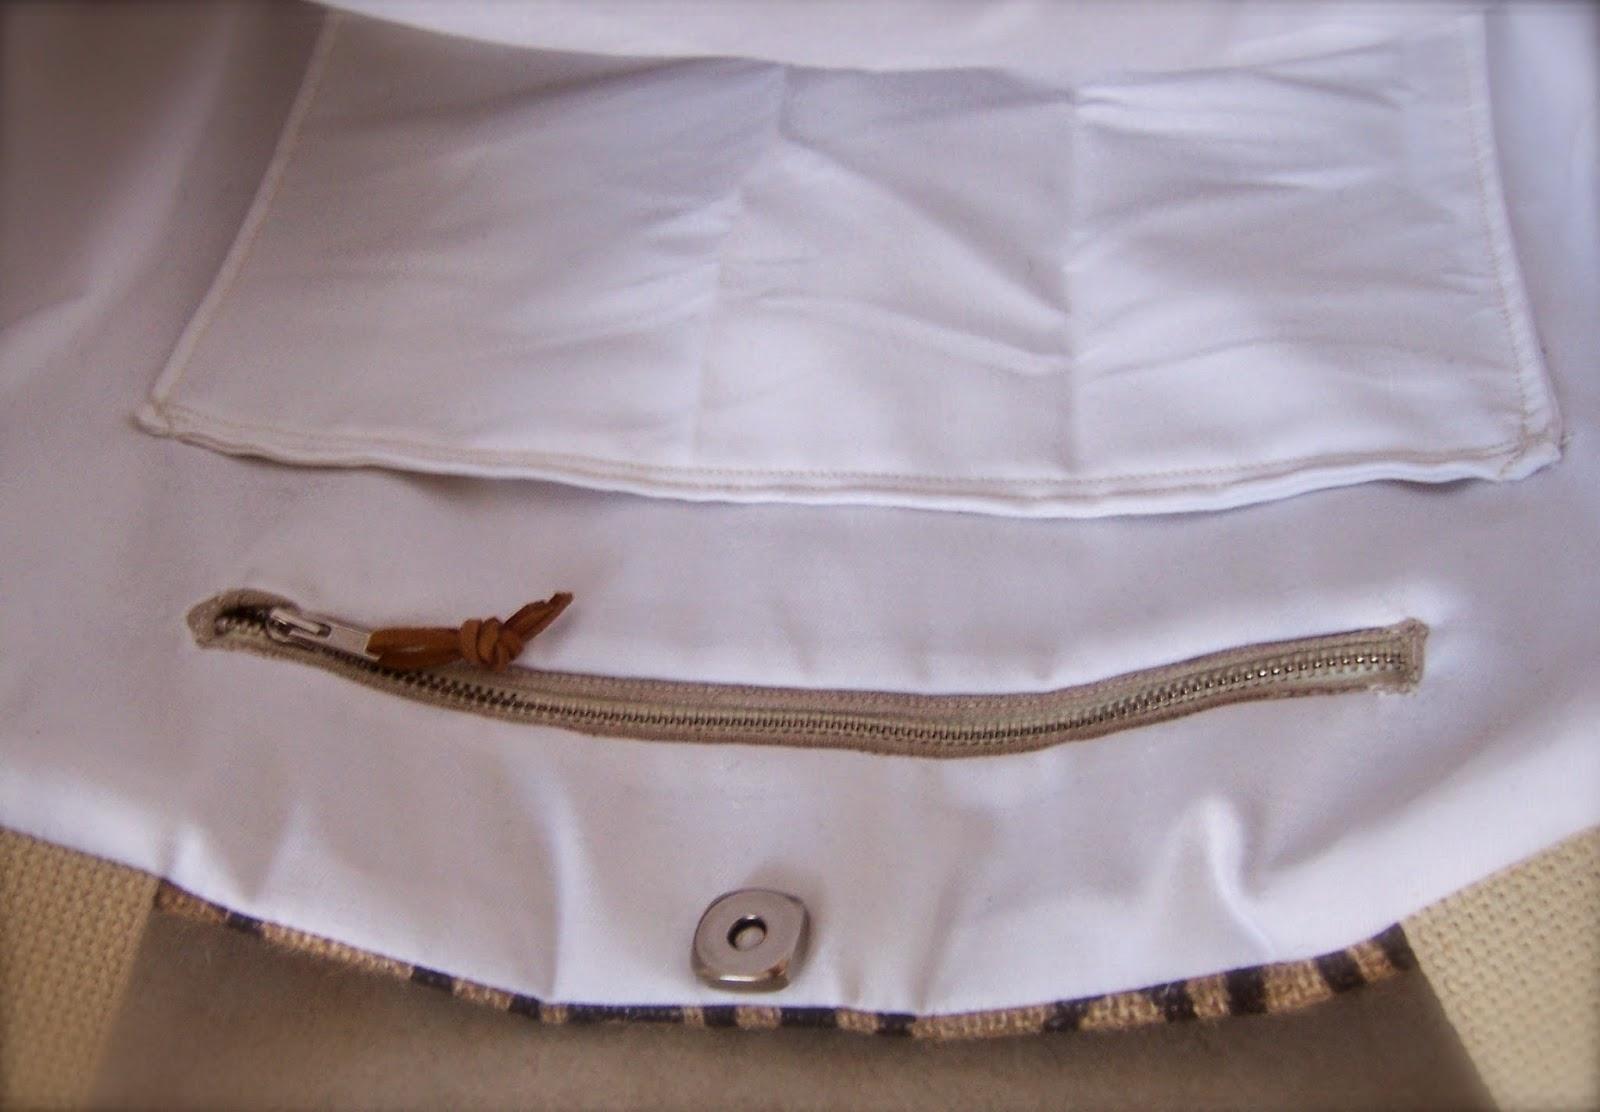 Clean Sound and New burlap tote bag - interior detail - linaandvi.blogspot.com